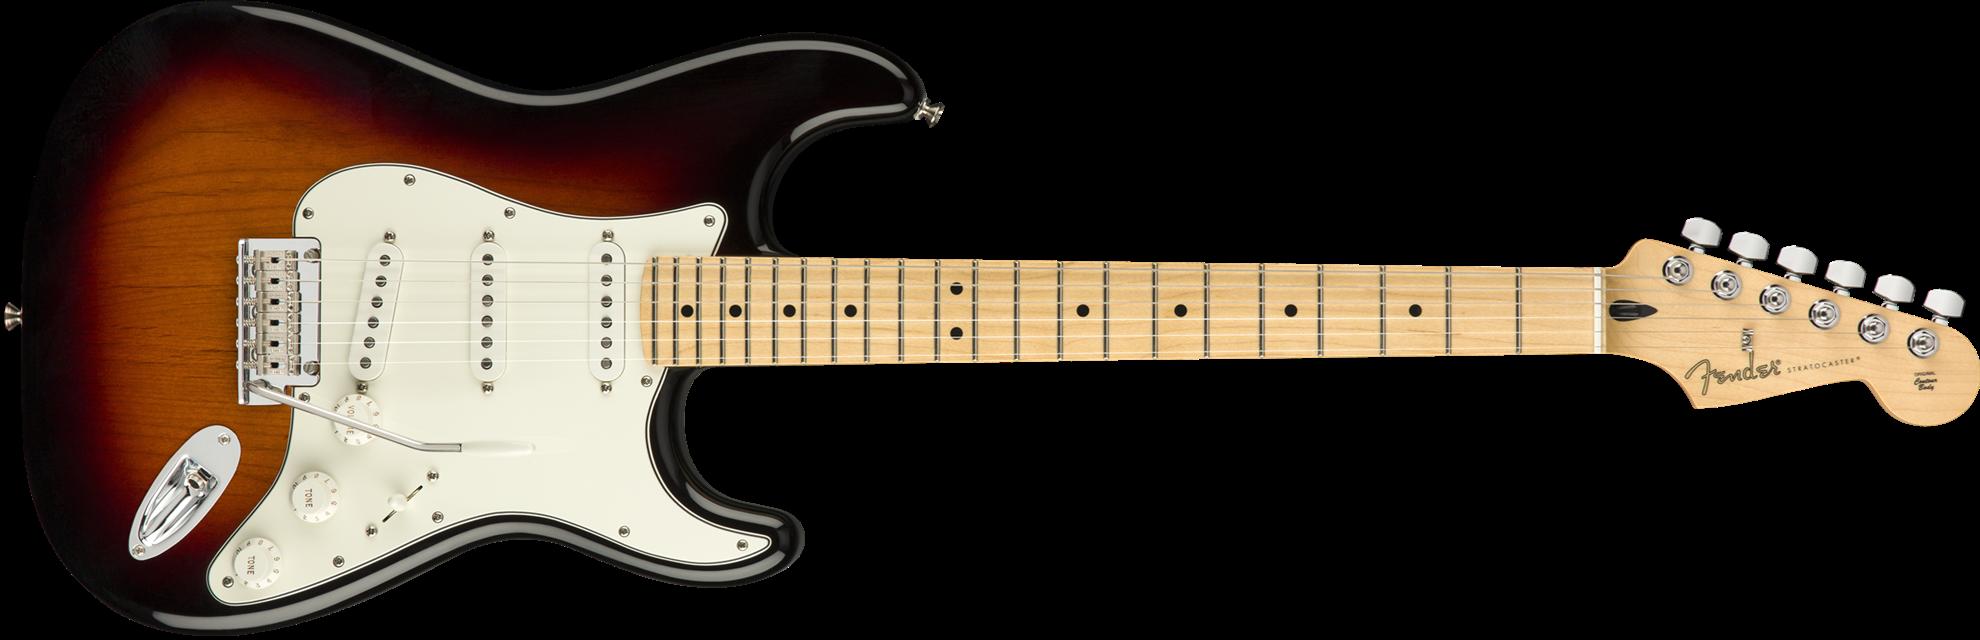 Fender Player Stratocaster Electric Guitar - Maple Neck - 3 Colour Sunburst